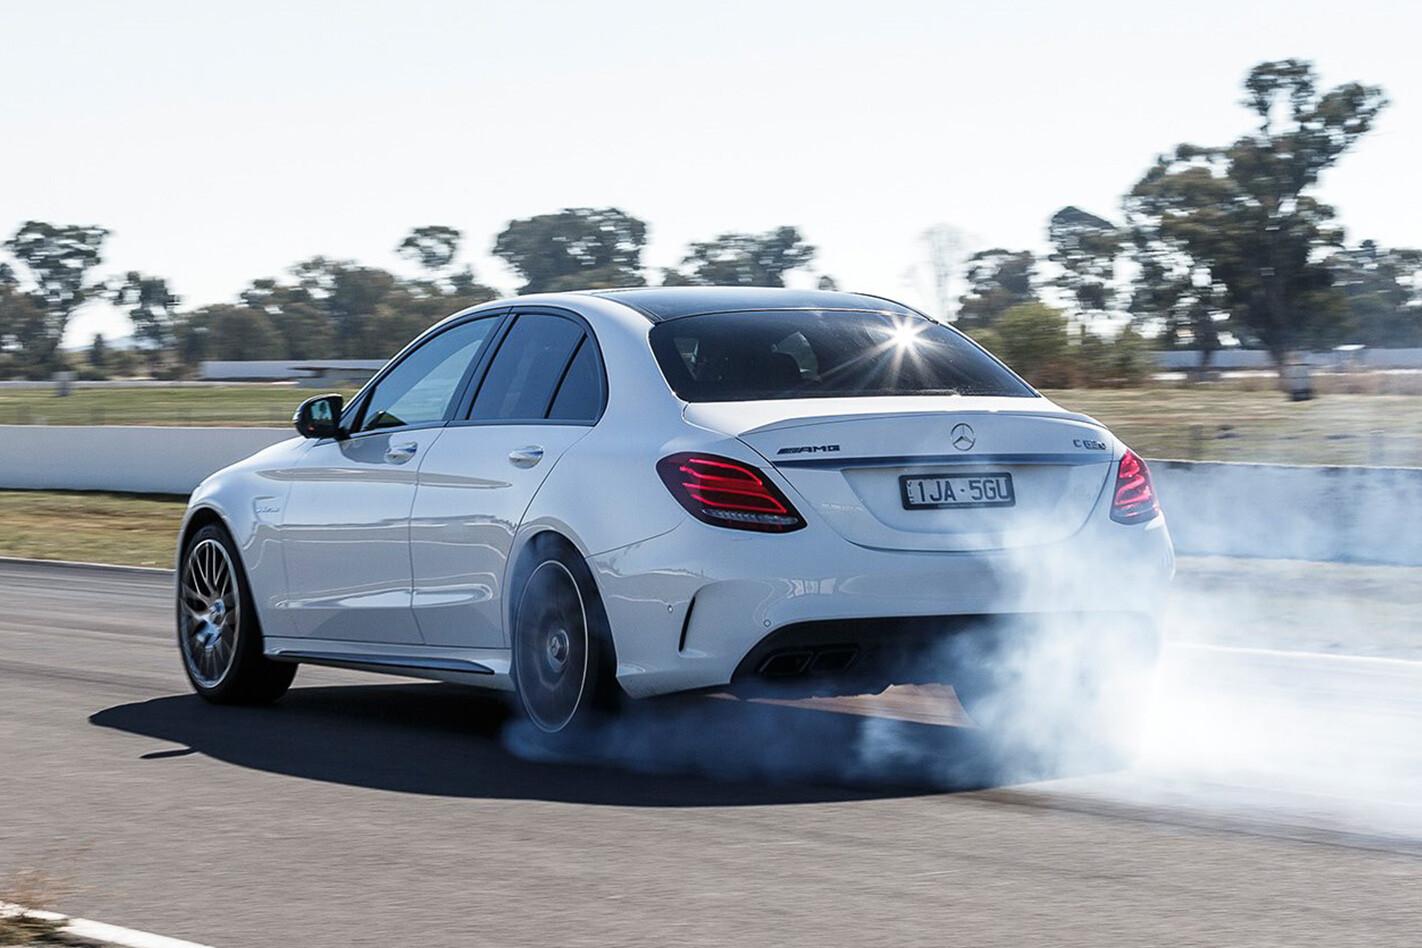 Mercedes-AMG-V8-C-Class-coupe.jpg